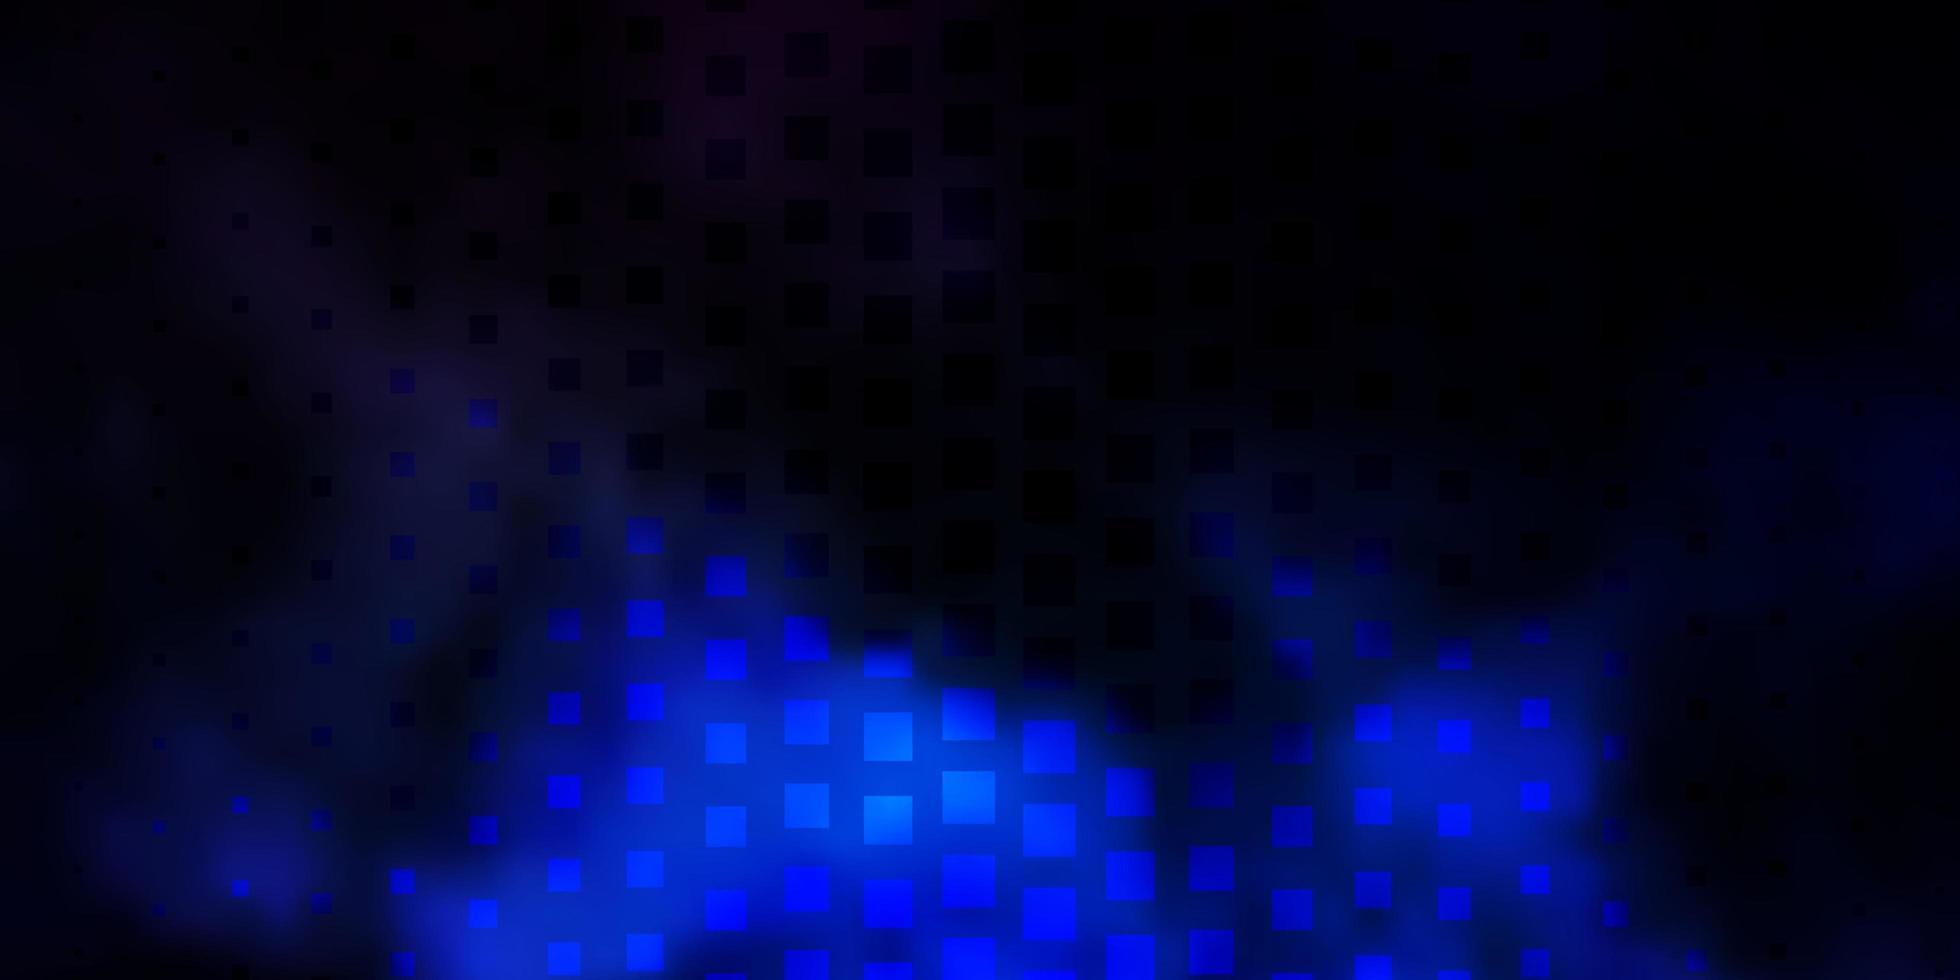 Dark BLUE vector template in rectangles.